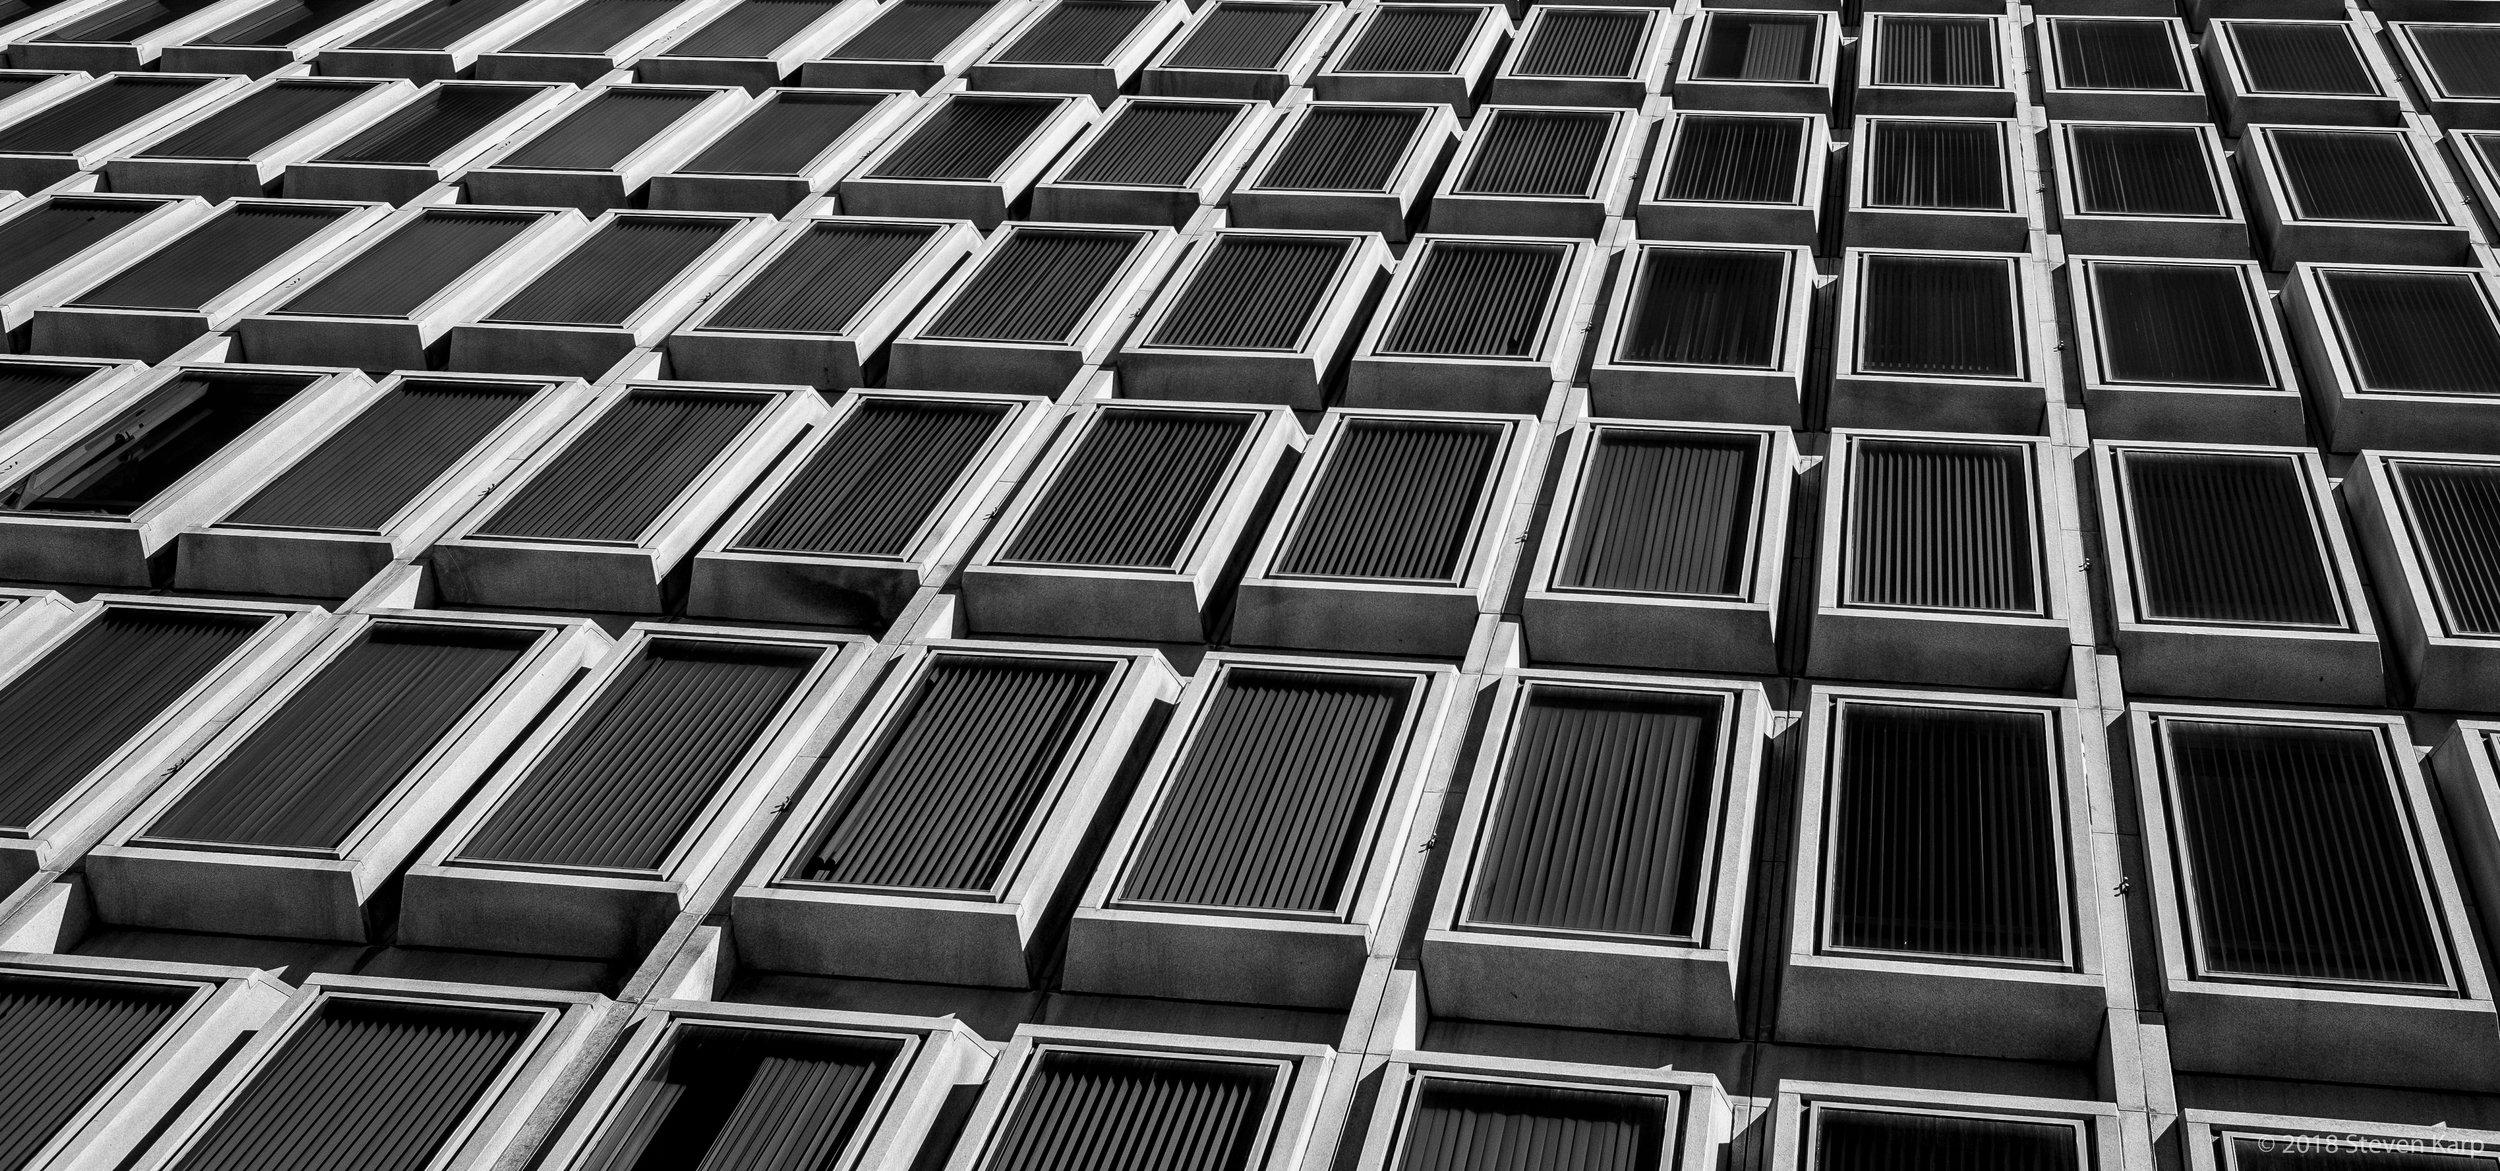 Municipal Services Building, Philadelphia, PA ©2019 S. Karp